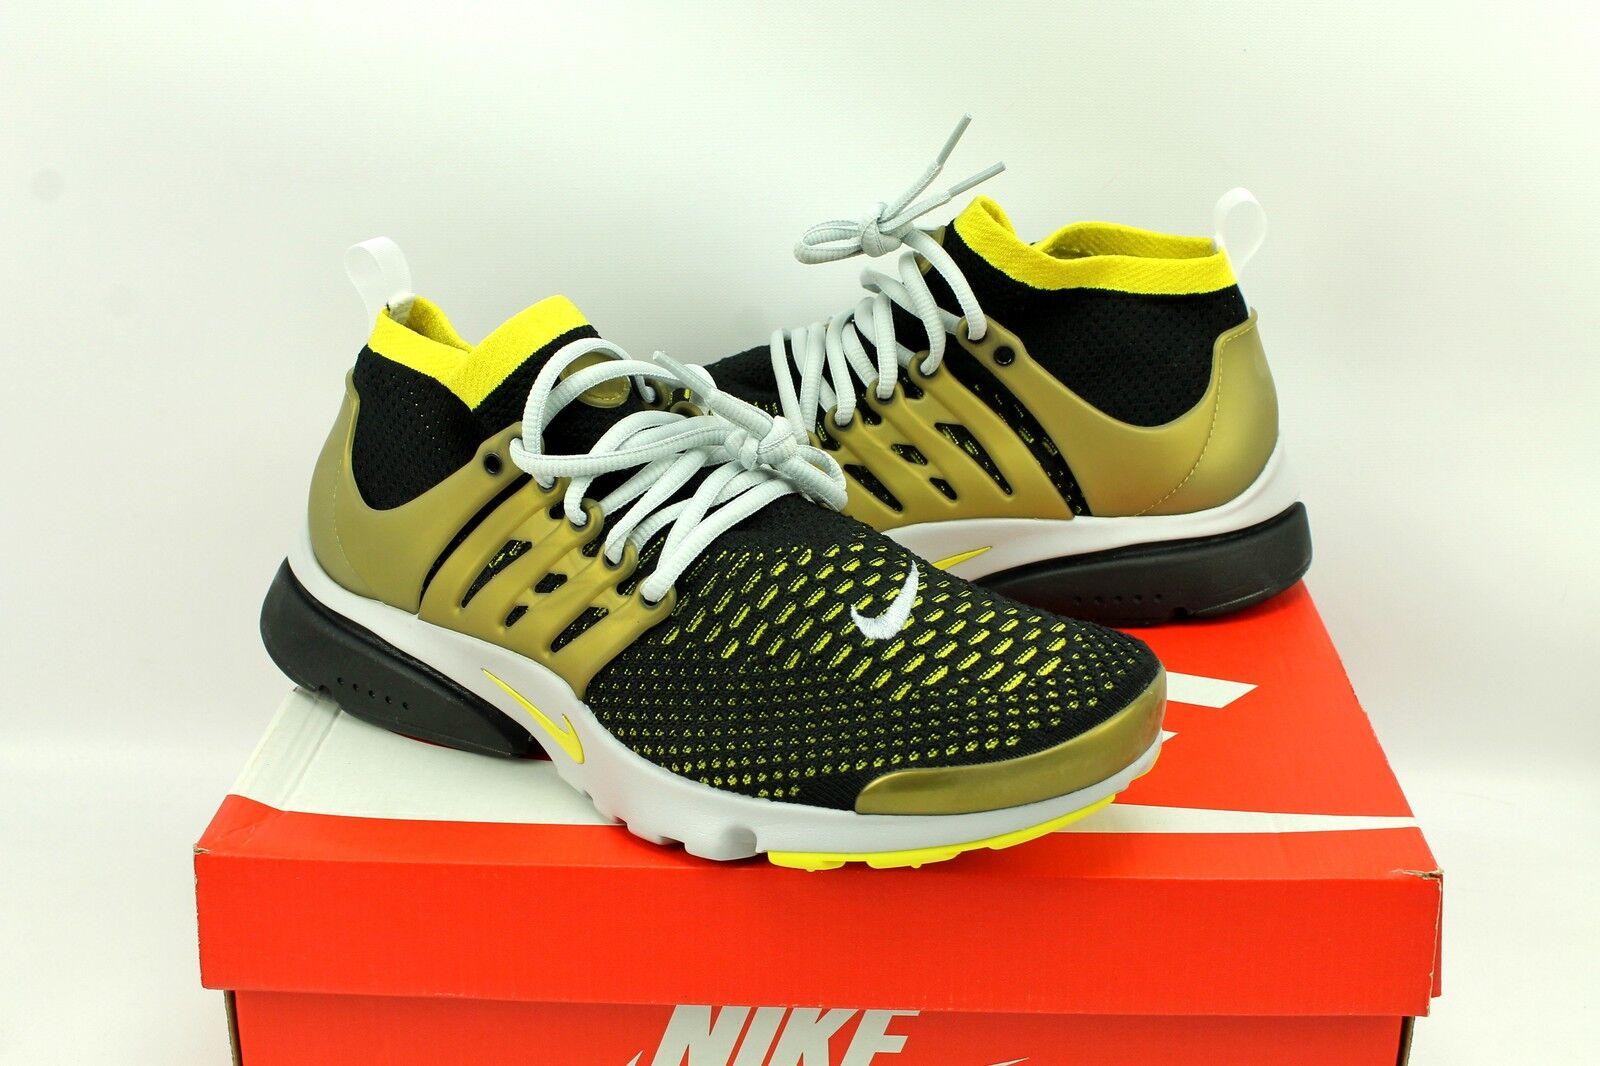 Nike Air Presto Flyknit Flyknit Flyknit Ultra nero oro Running scarpe 835570-007 Uomo 10.5 732561